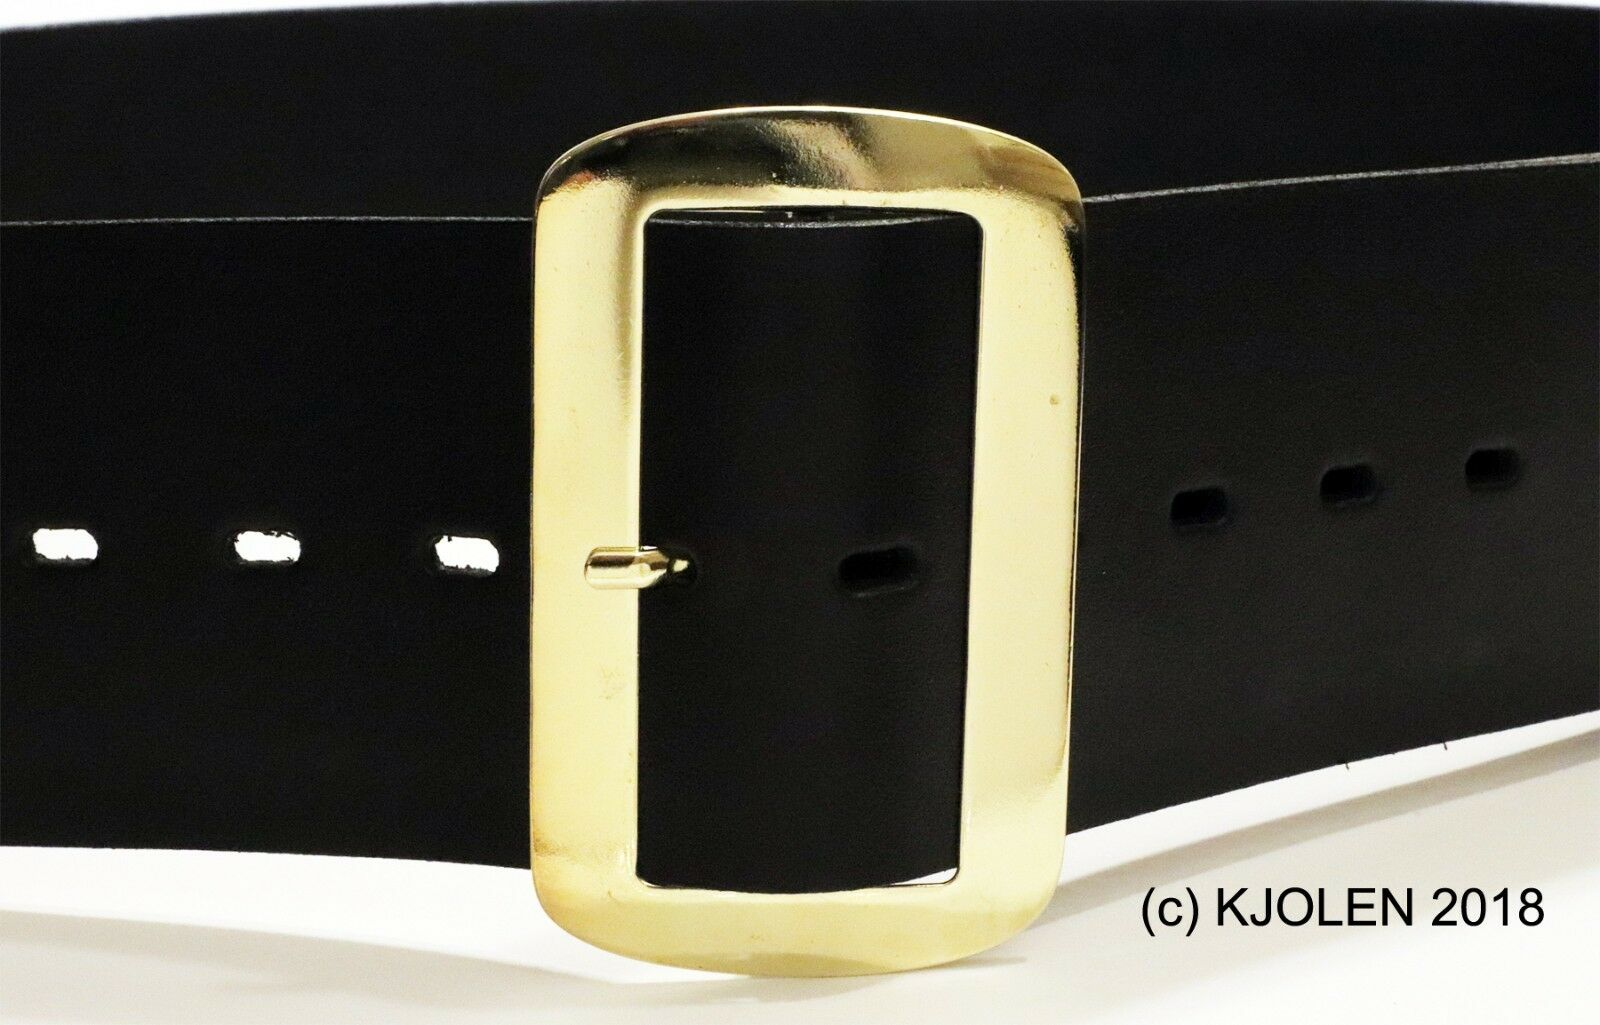 santa claus belt matte finish leather 3 inch christmas pirate gold silver buckle - Santa Claus Belt